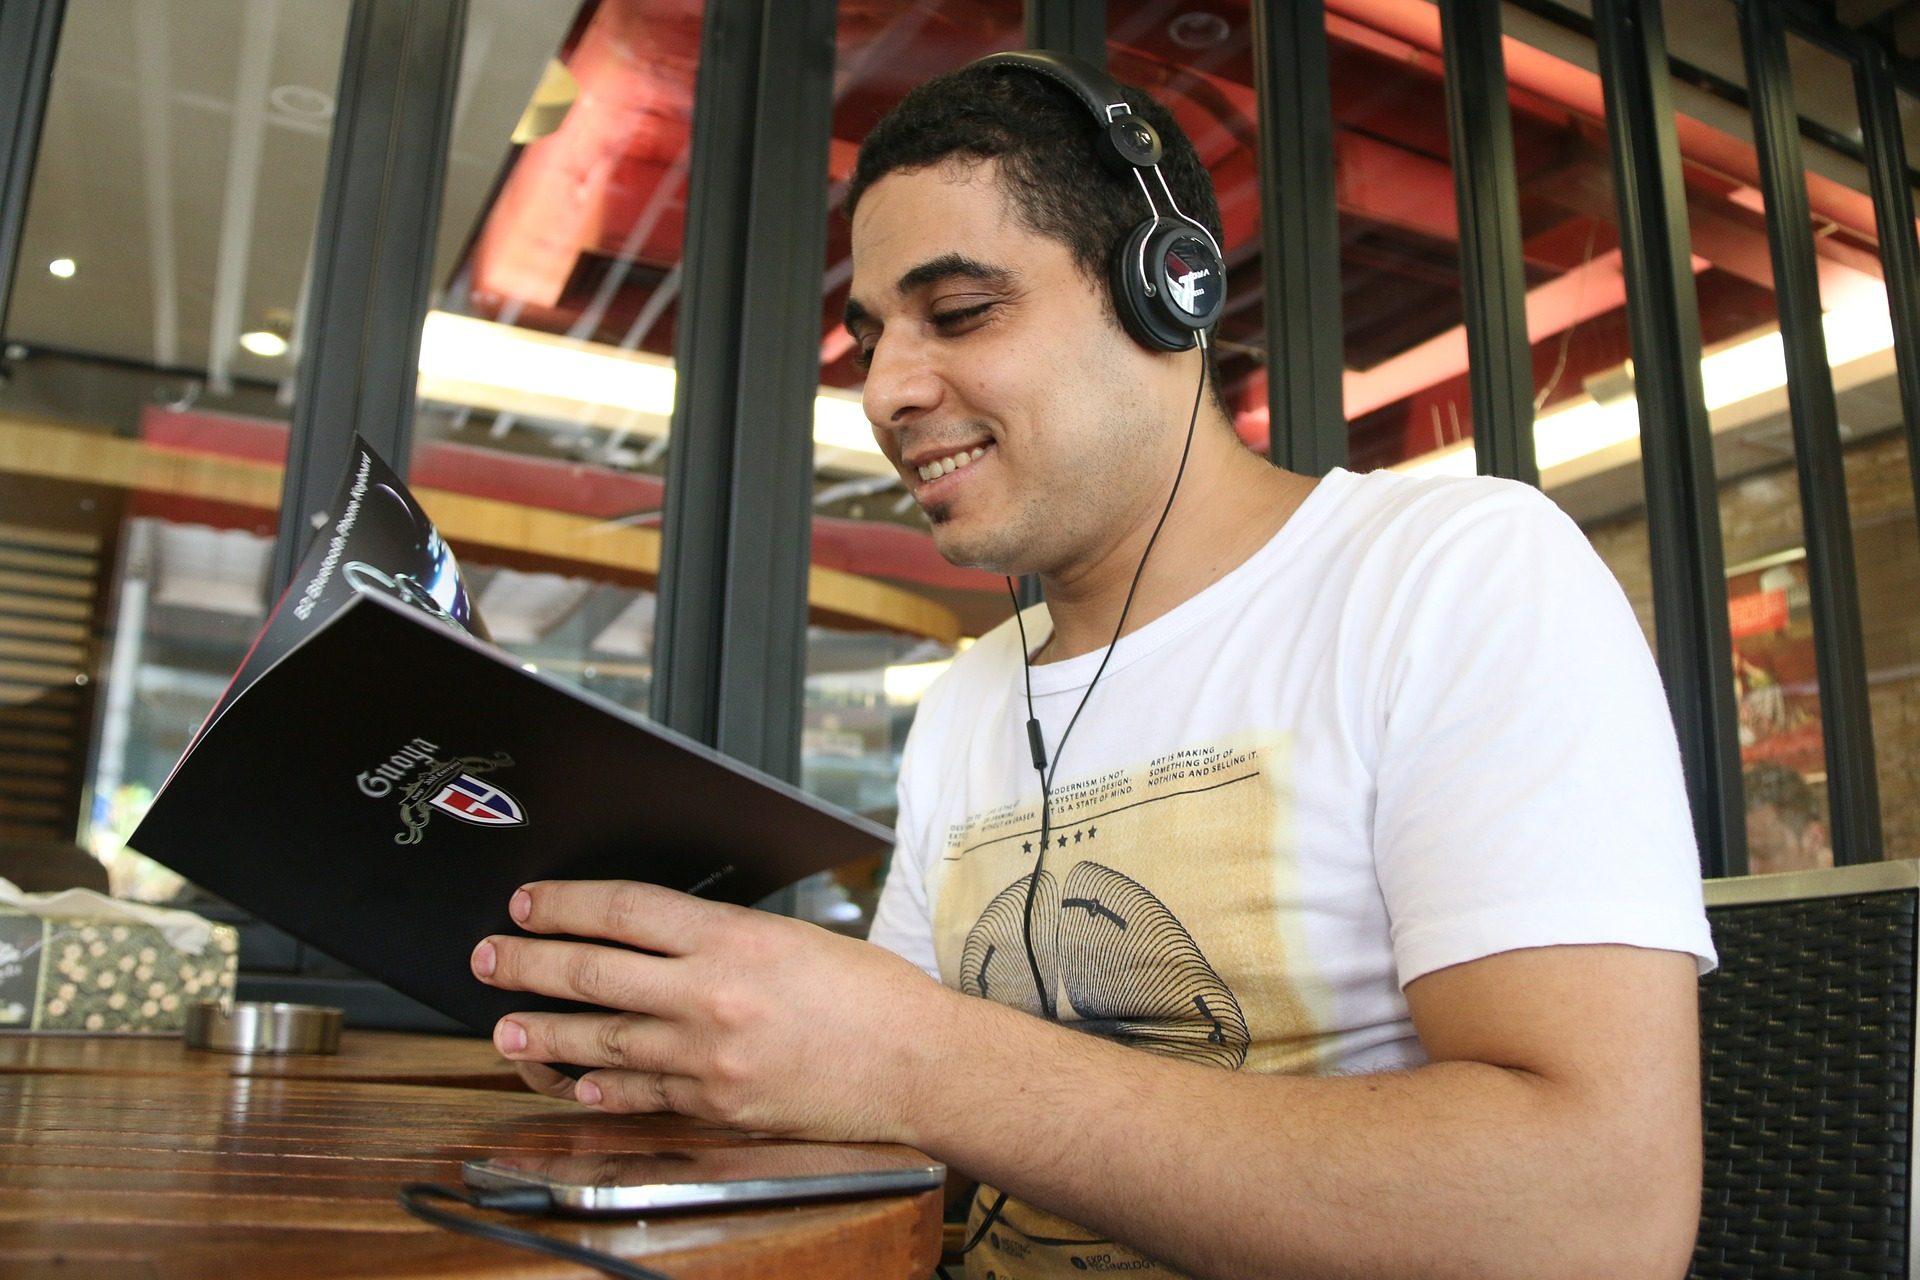 ascoltare la radio-radio streaming-consulenza radiofonica-web radio-ascoltare radio-ascoltare musica gratis-diretta radio